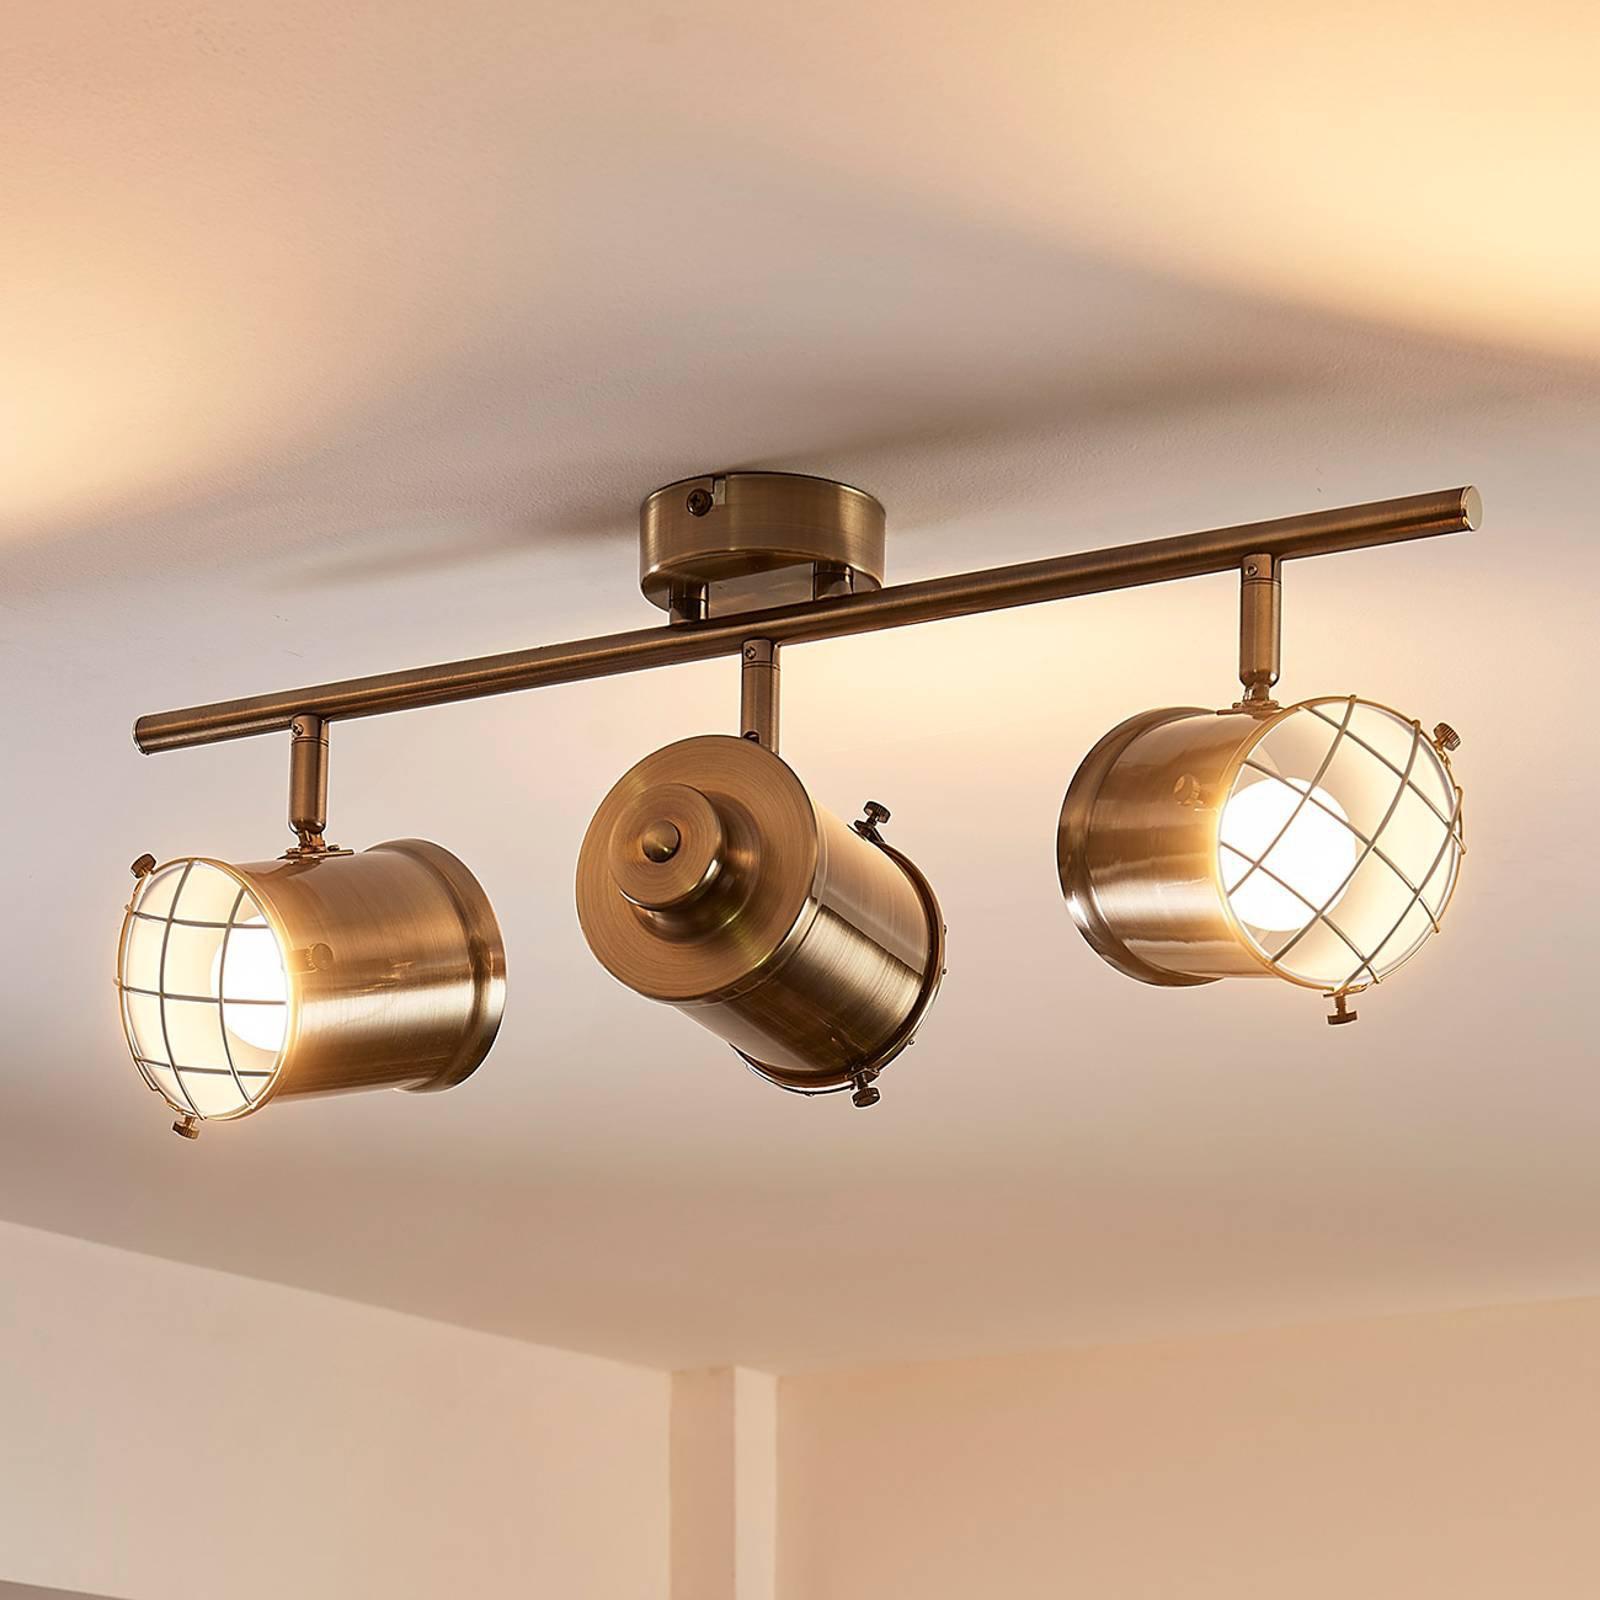 Easydim-taklampe Ebbi med LED, tre lys